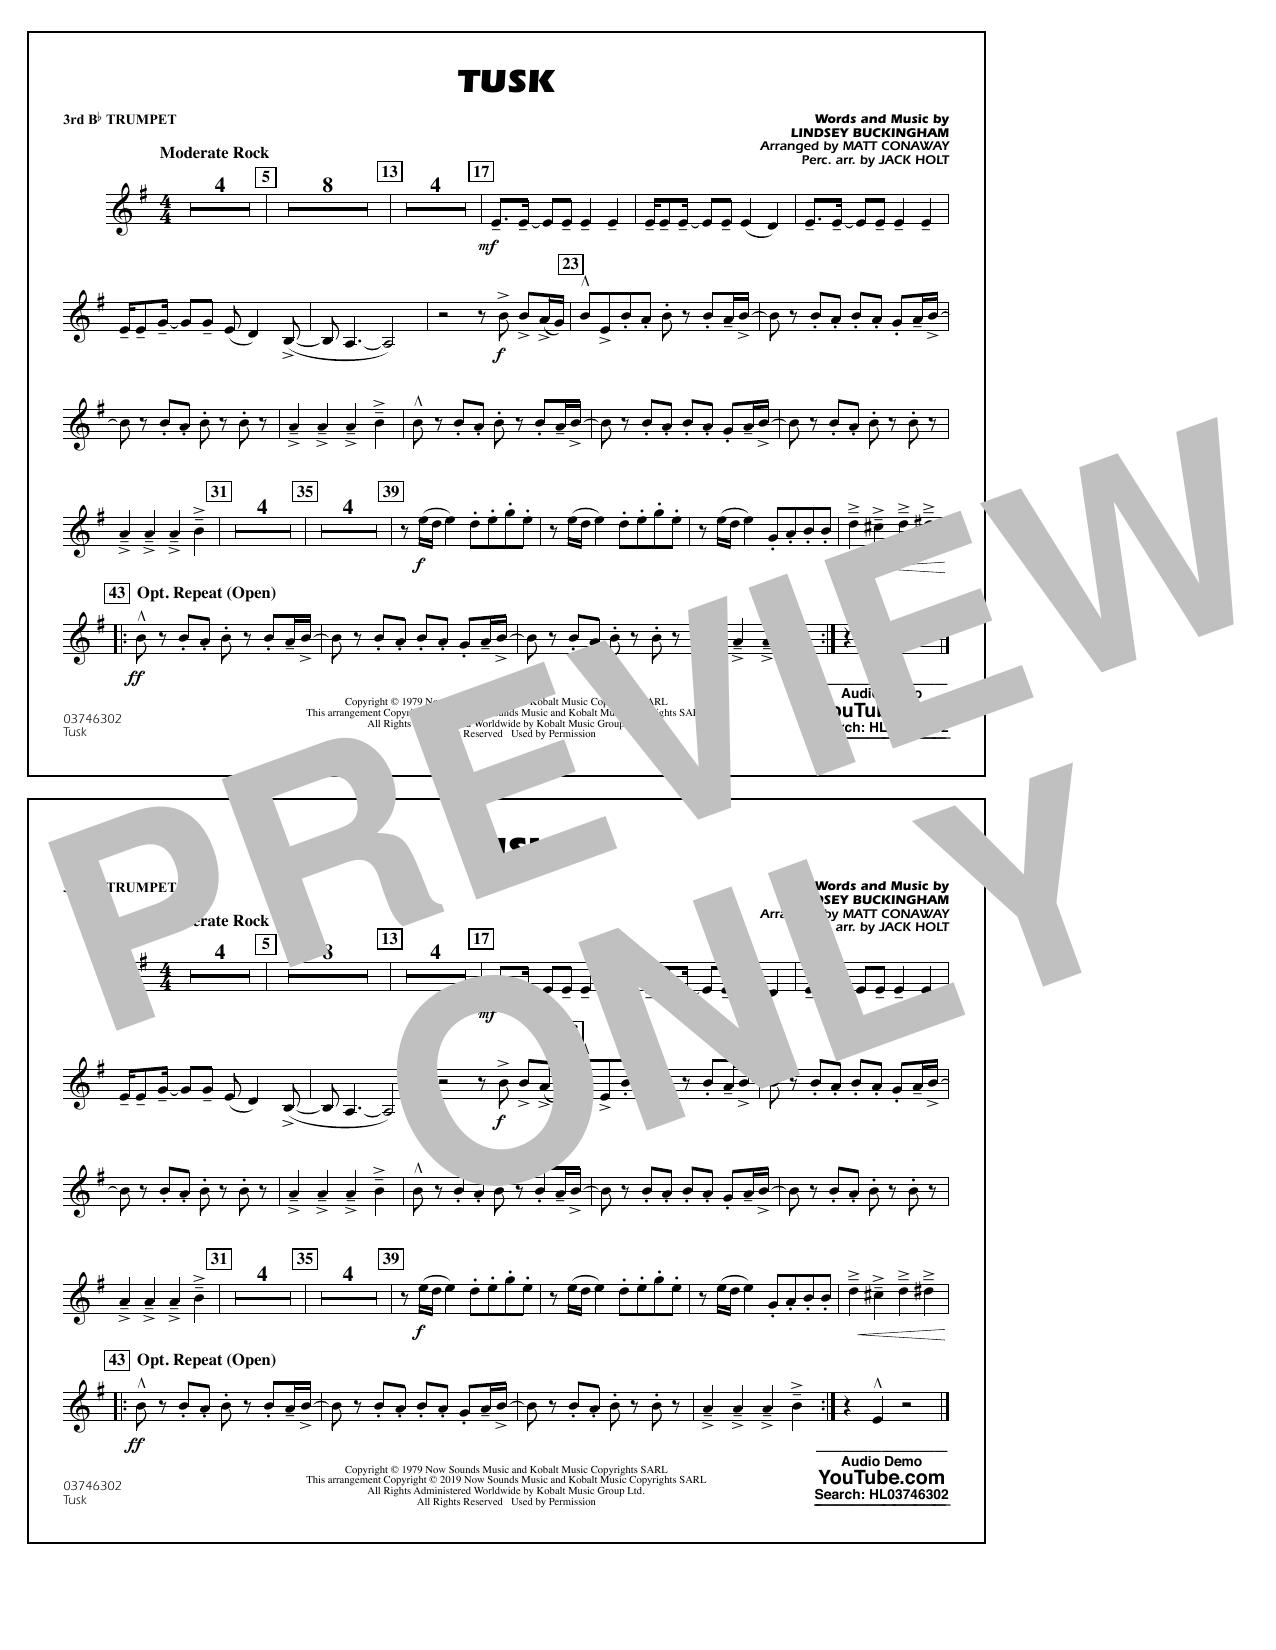 Fleetwood Mac Tusk (arr. Matt Conaway) - 3rd Bb Trumpet sheet music notes and chords